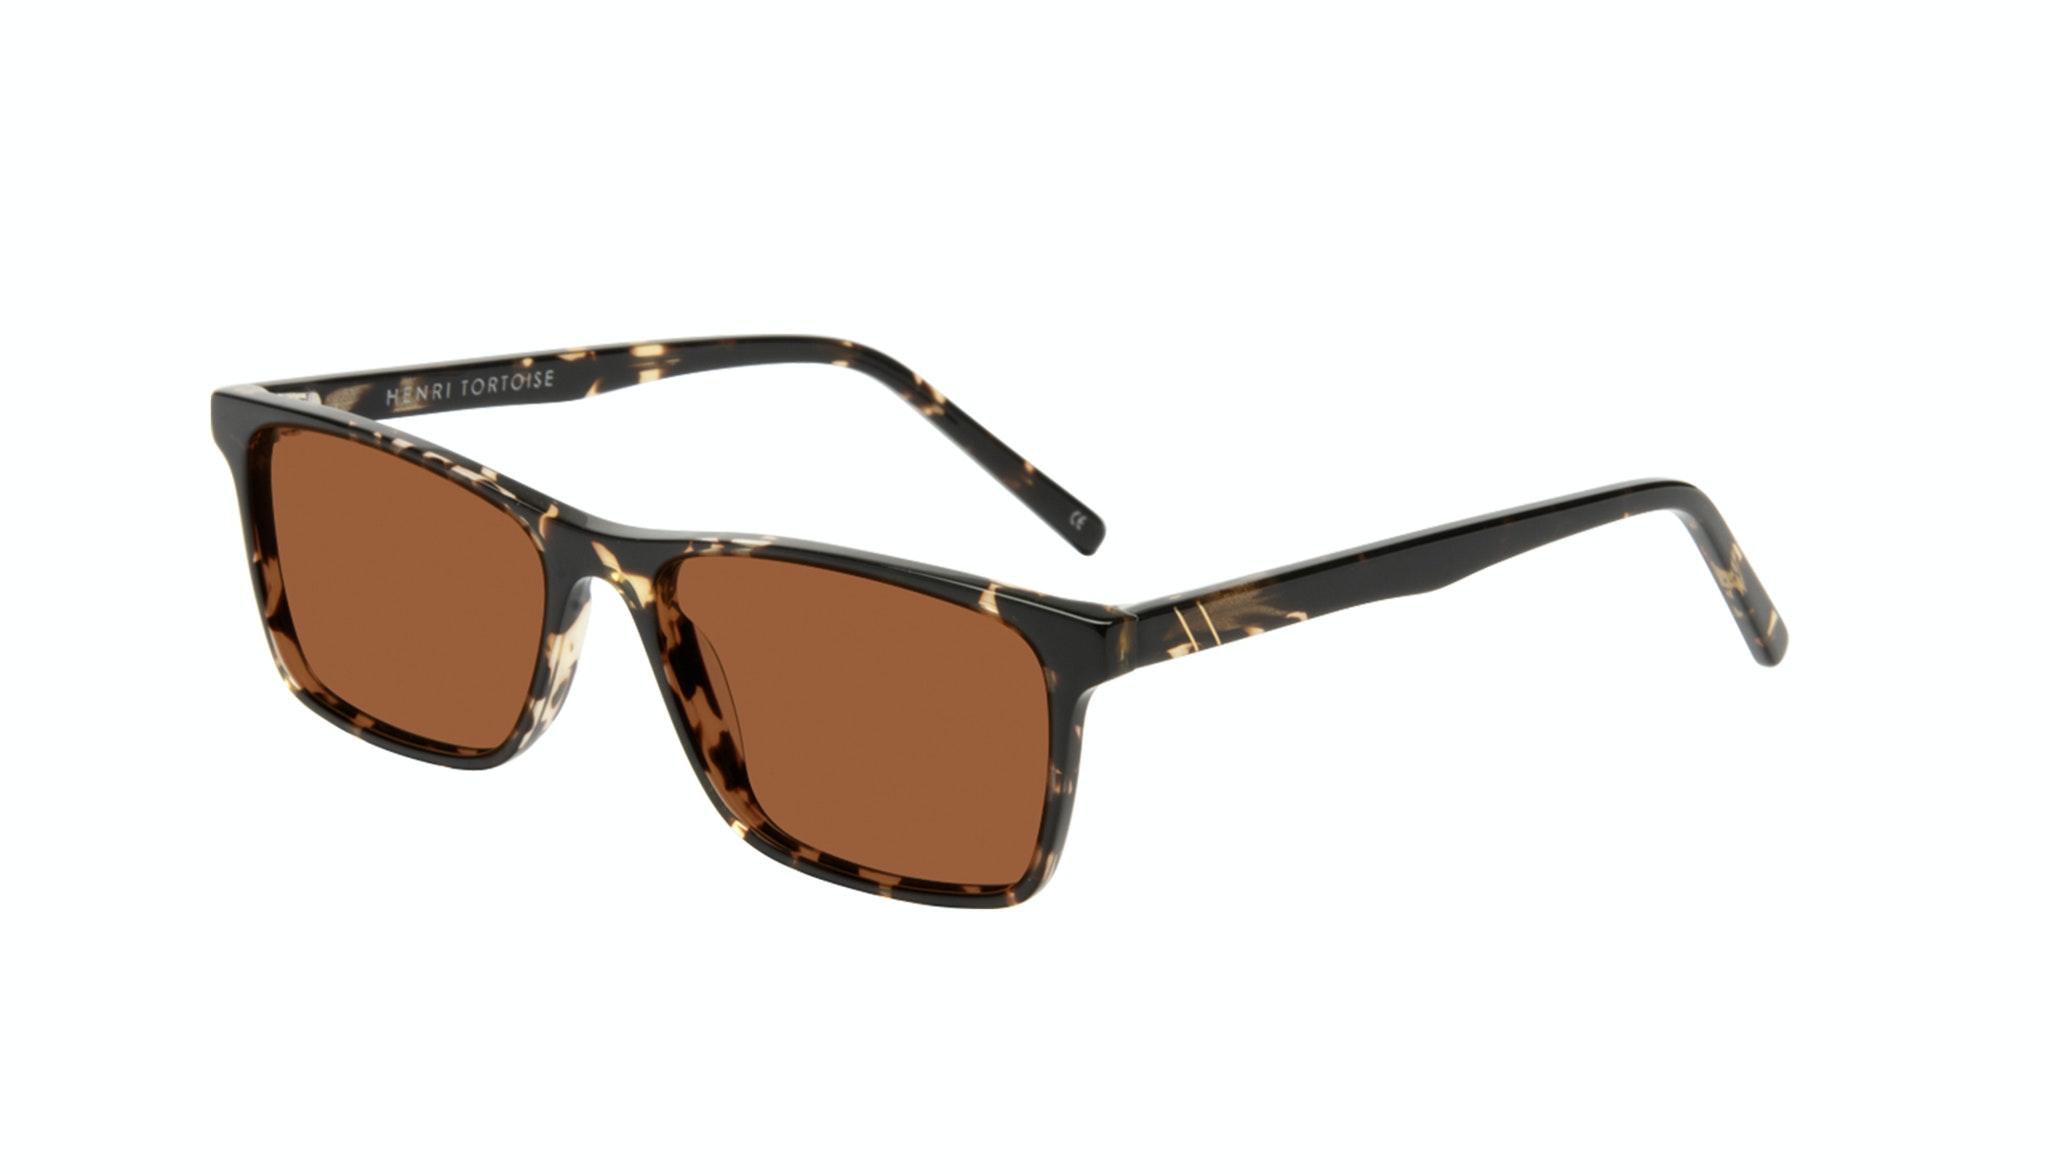 Affordable Fashion Glasses Rectangle Sunglasses Men Henri Tortoise Tilt